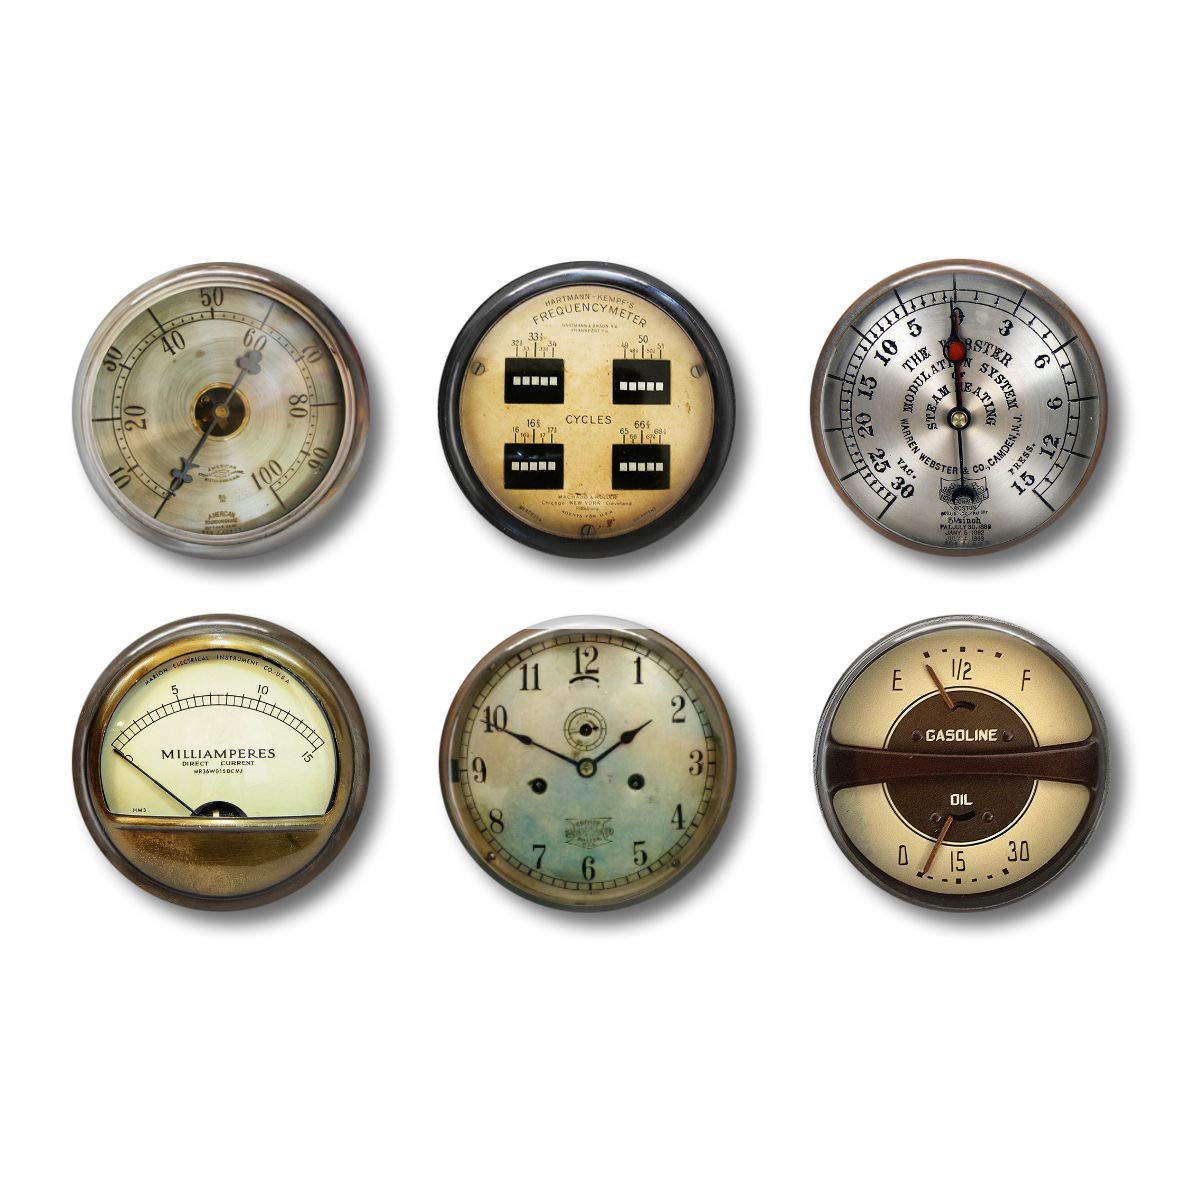 Fun Locker Magnets For Boys - Vintage Gauges - Fun School Supplies - Whiteboard Office or Fridge - Funny Magnet Gift Set (Gauges)